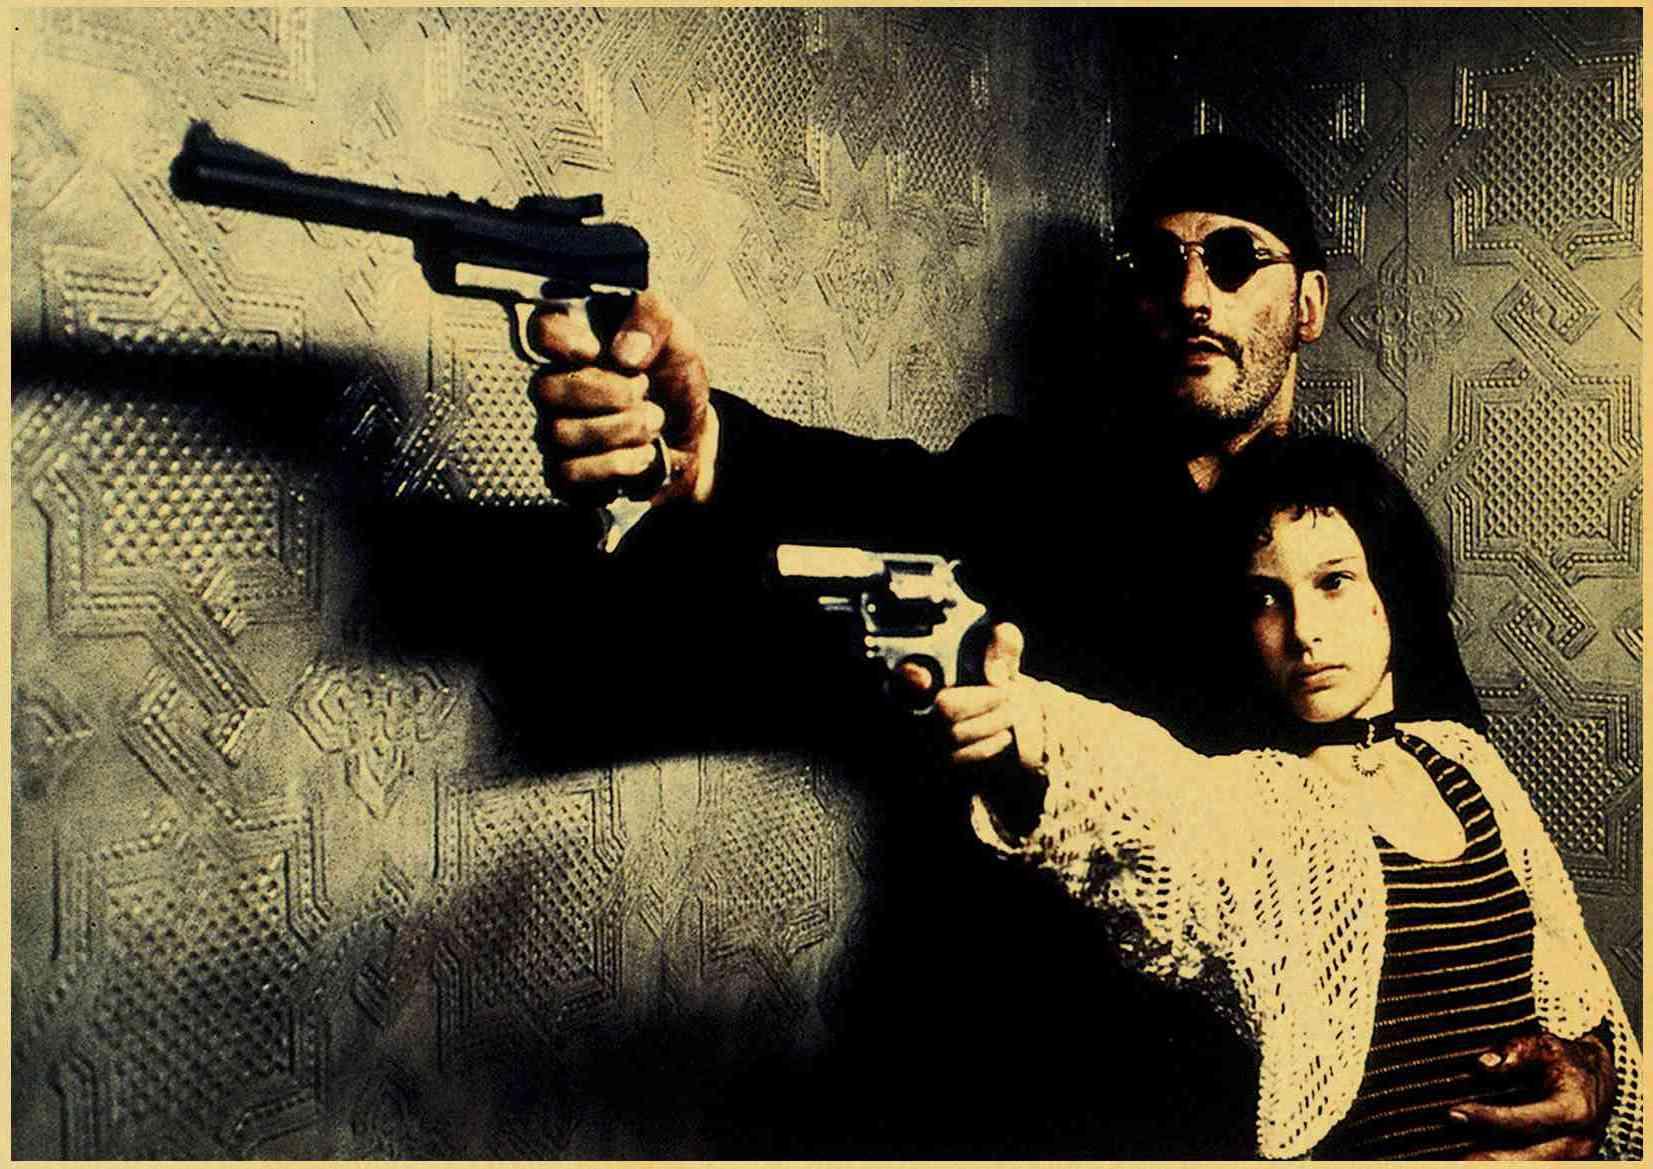 HTB1ZK6VMzTpK1RjSZKPq6y3UpXay Vintage Poster classic movie Pulp Fiction / Kill Bill/Fight Club poster Retro kraft paper posters decorative art painting